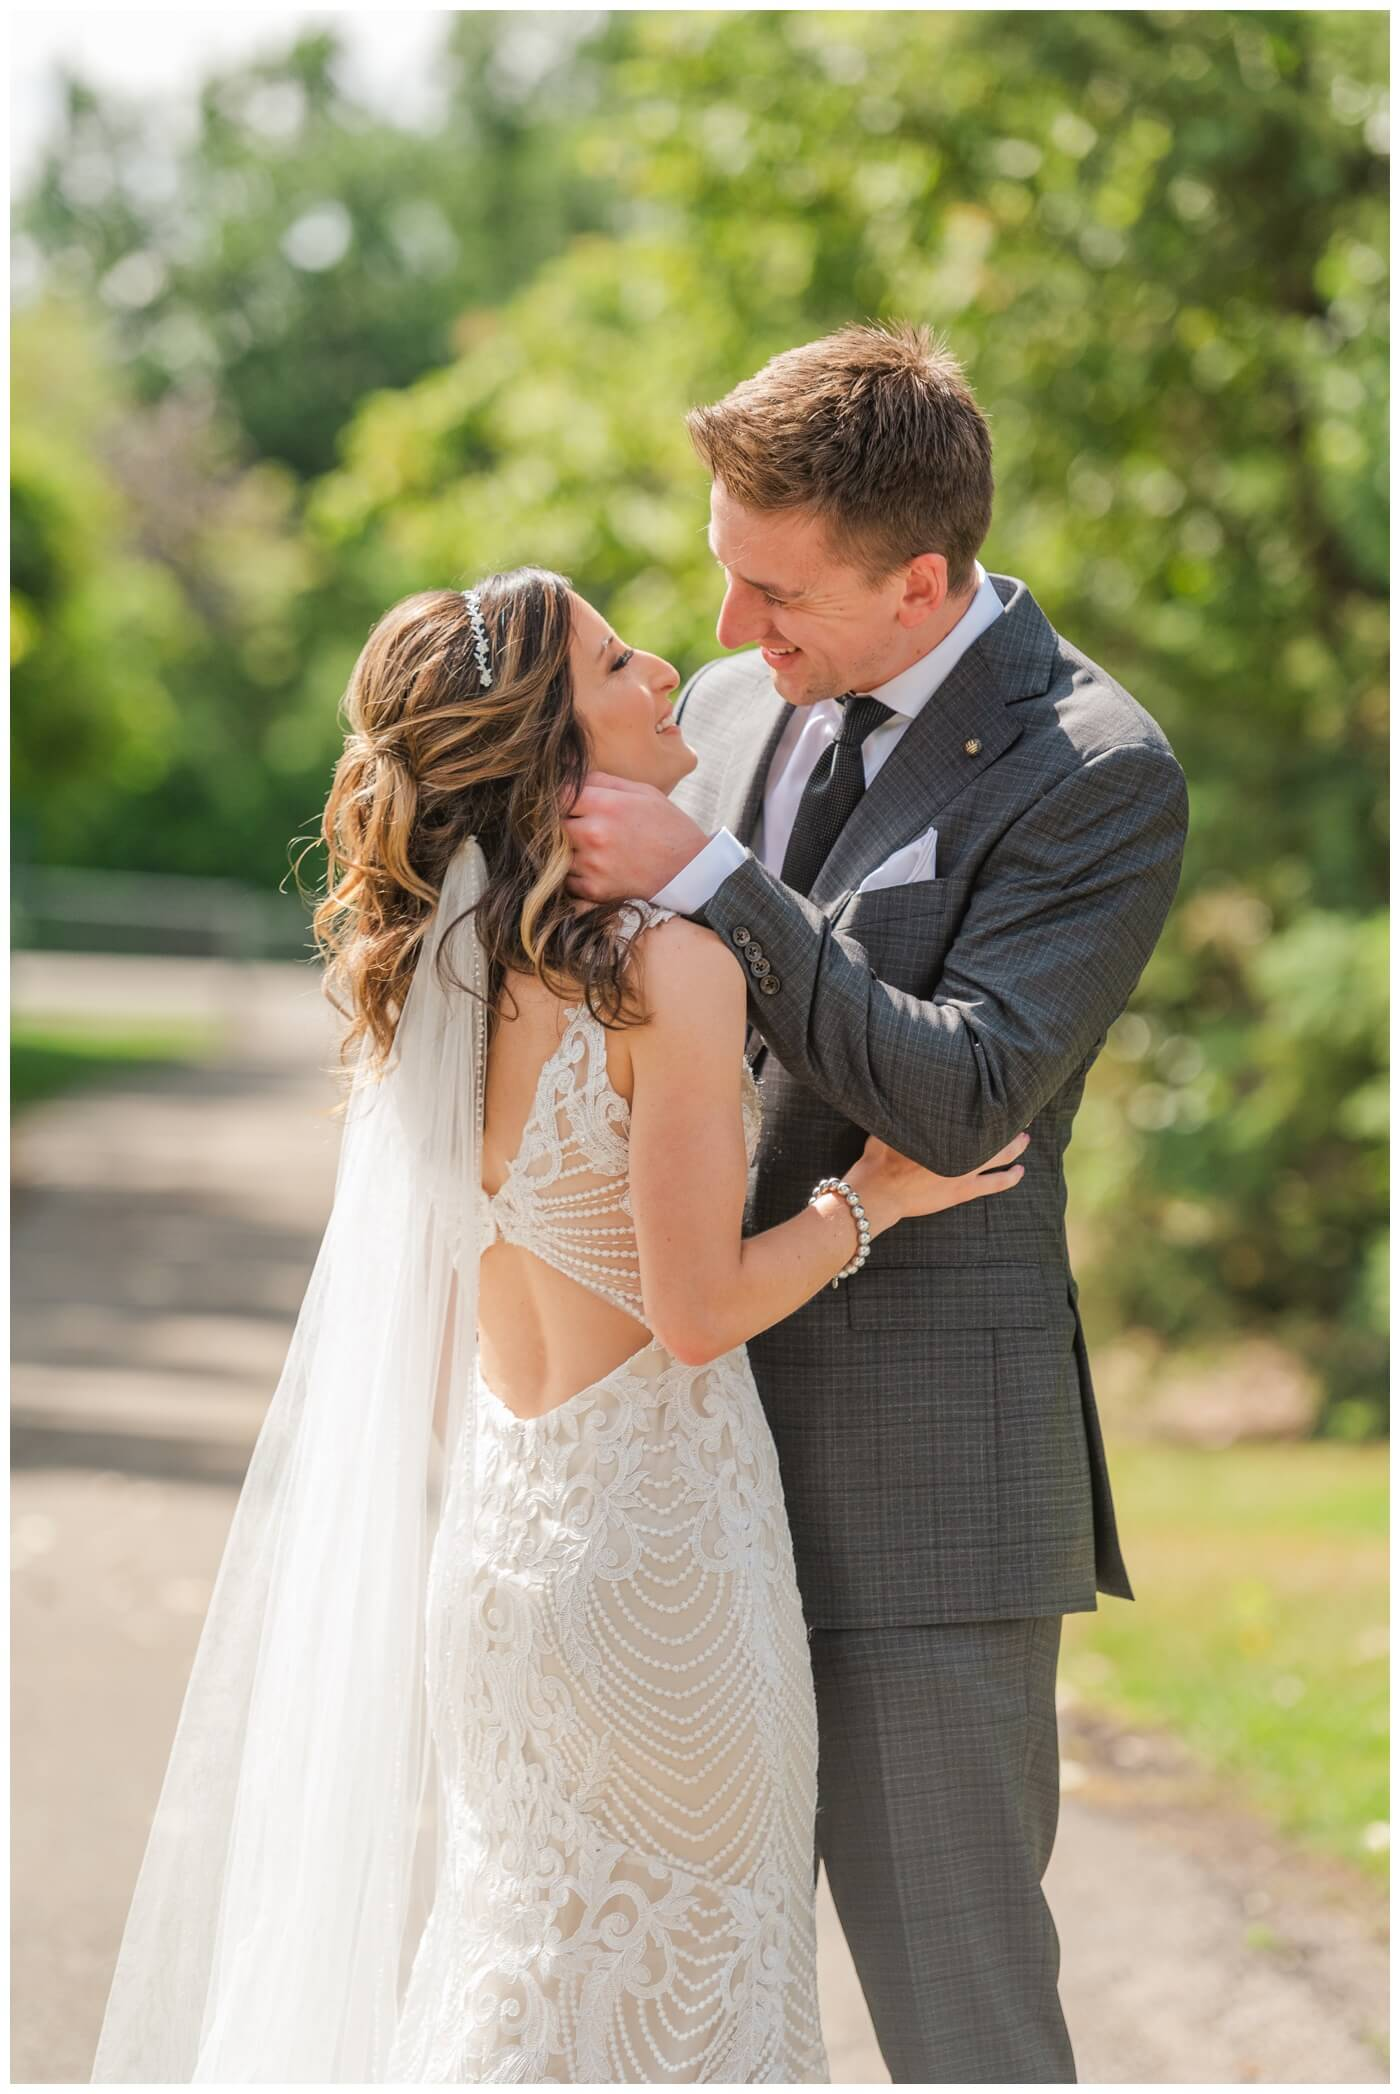 Taylor & Jolene - Emerald Park Wedding - 12 - Bride's beautiful dress from NWL in Regina